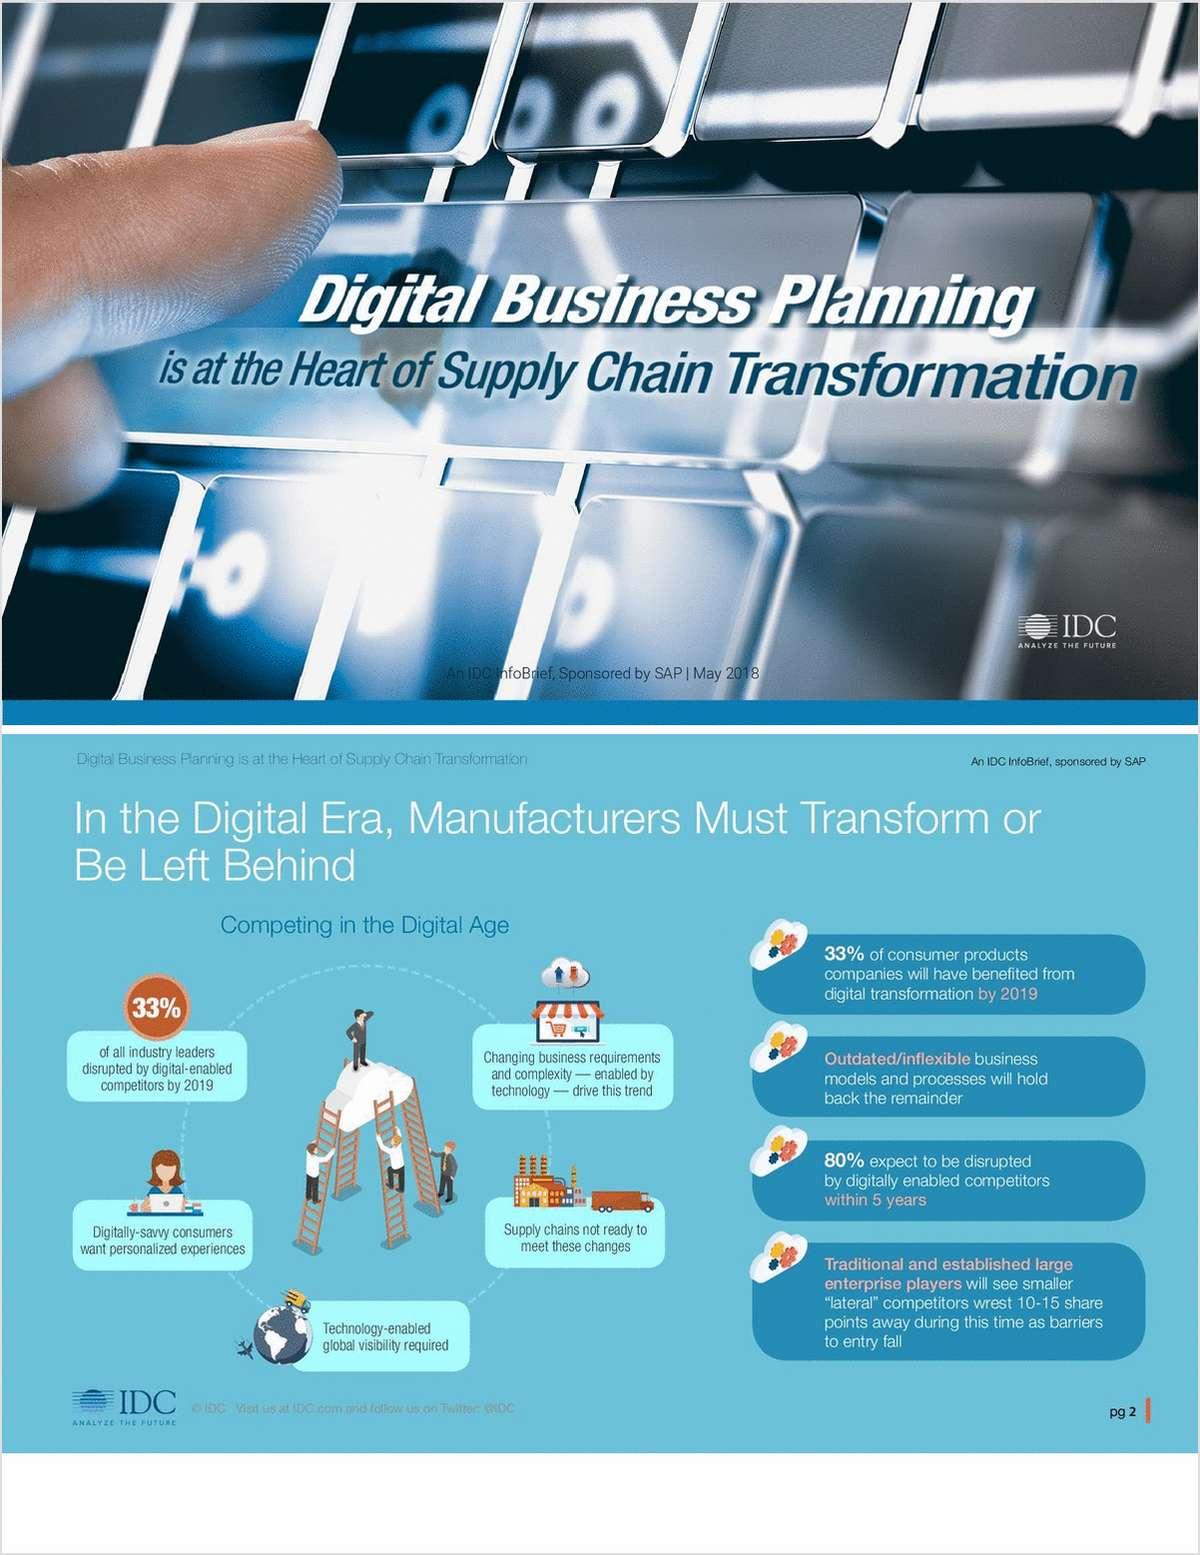 Digital Business Planning